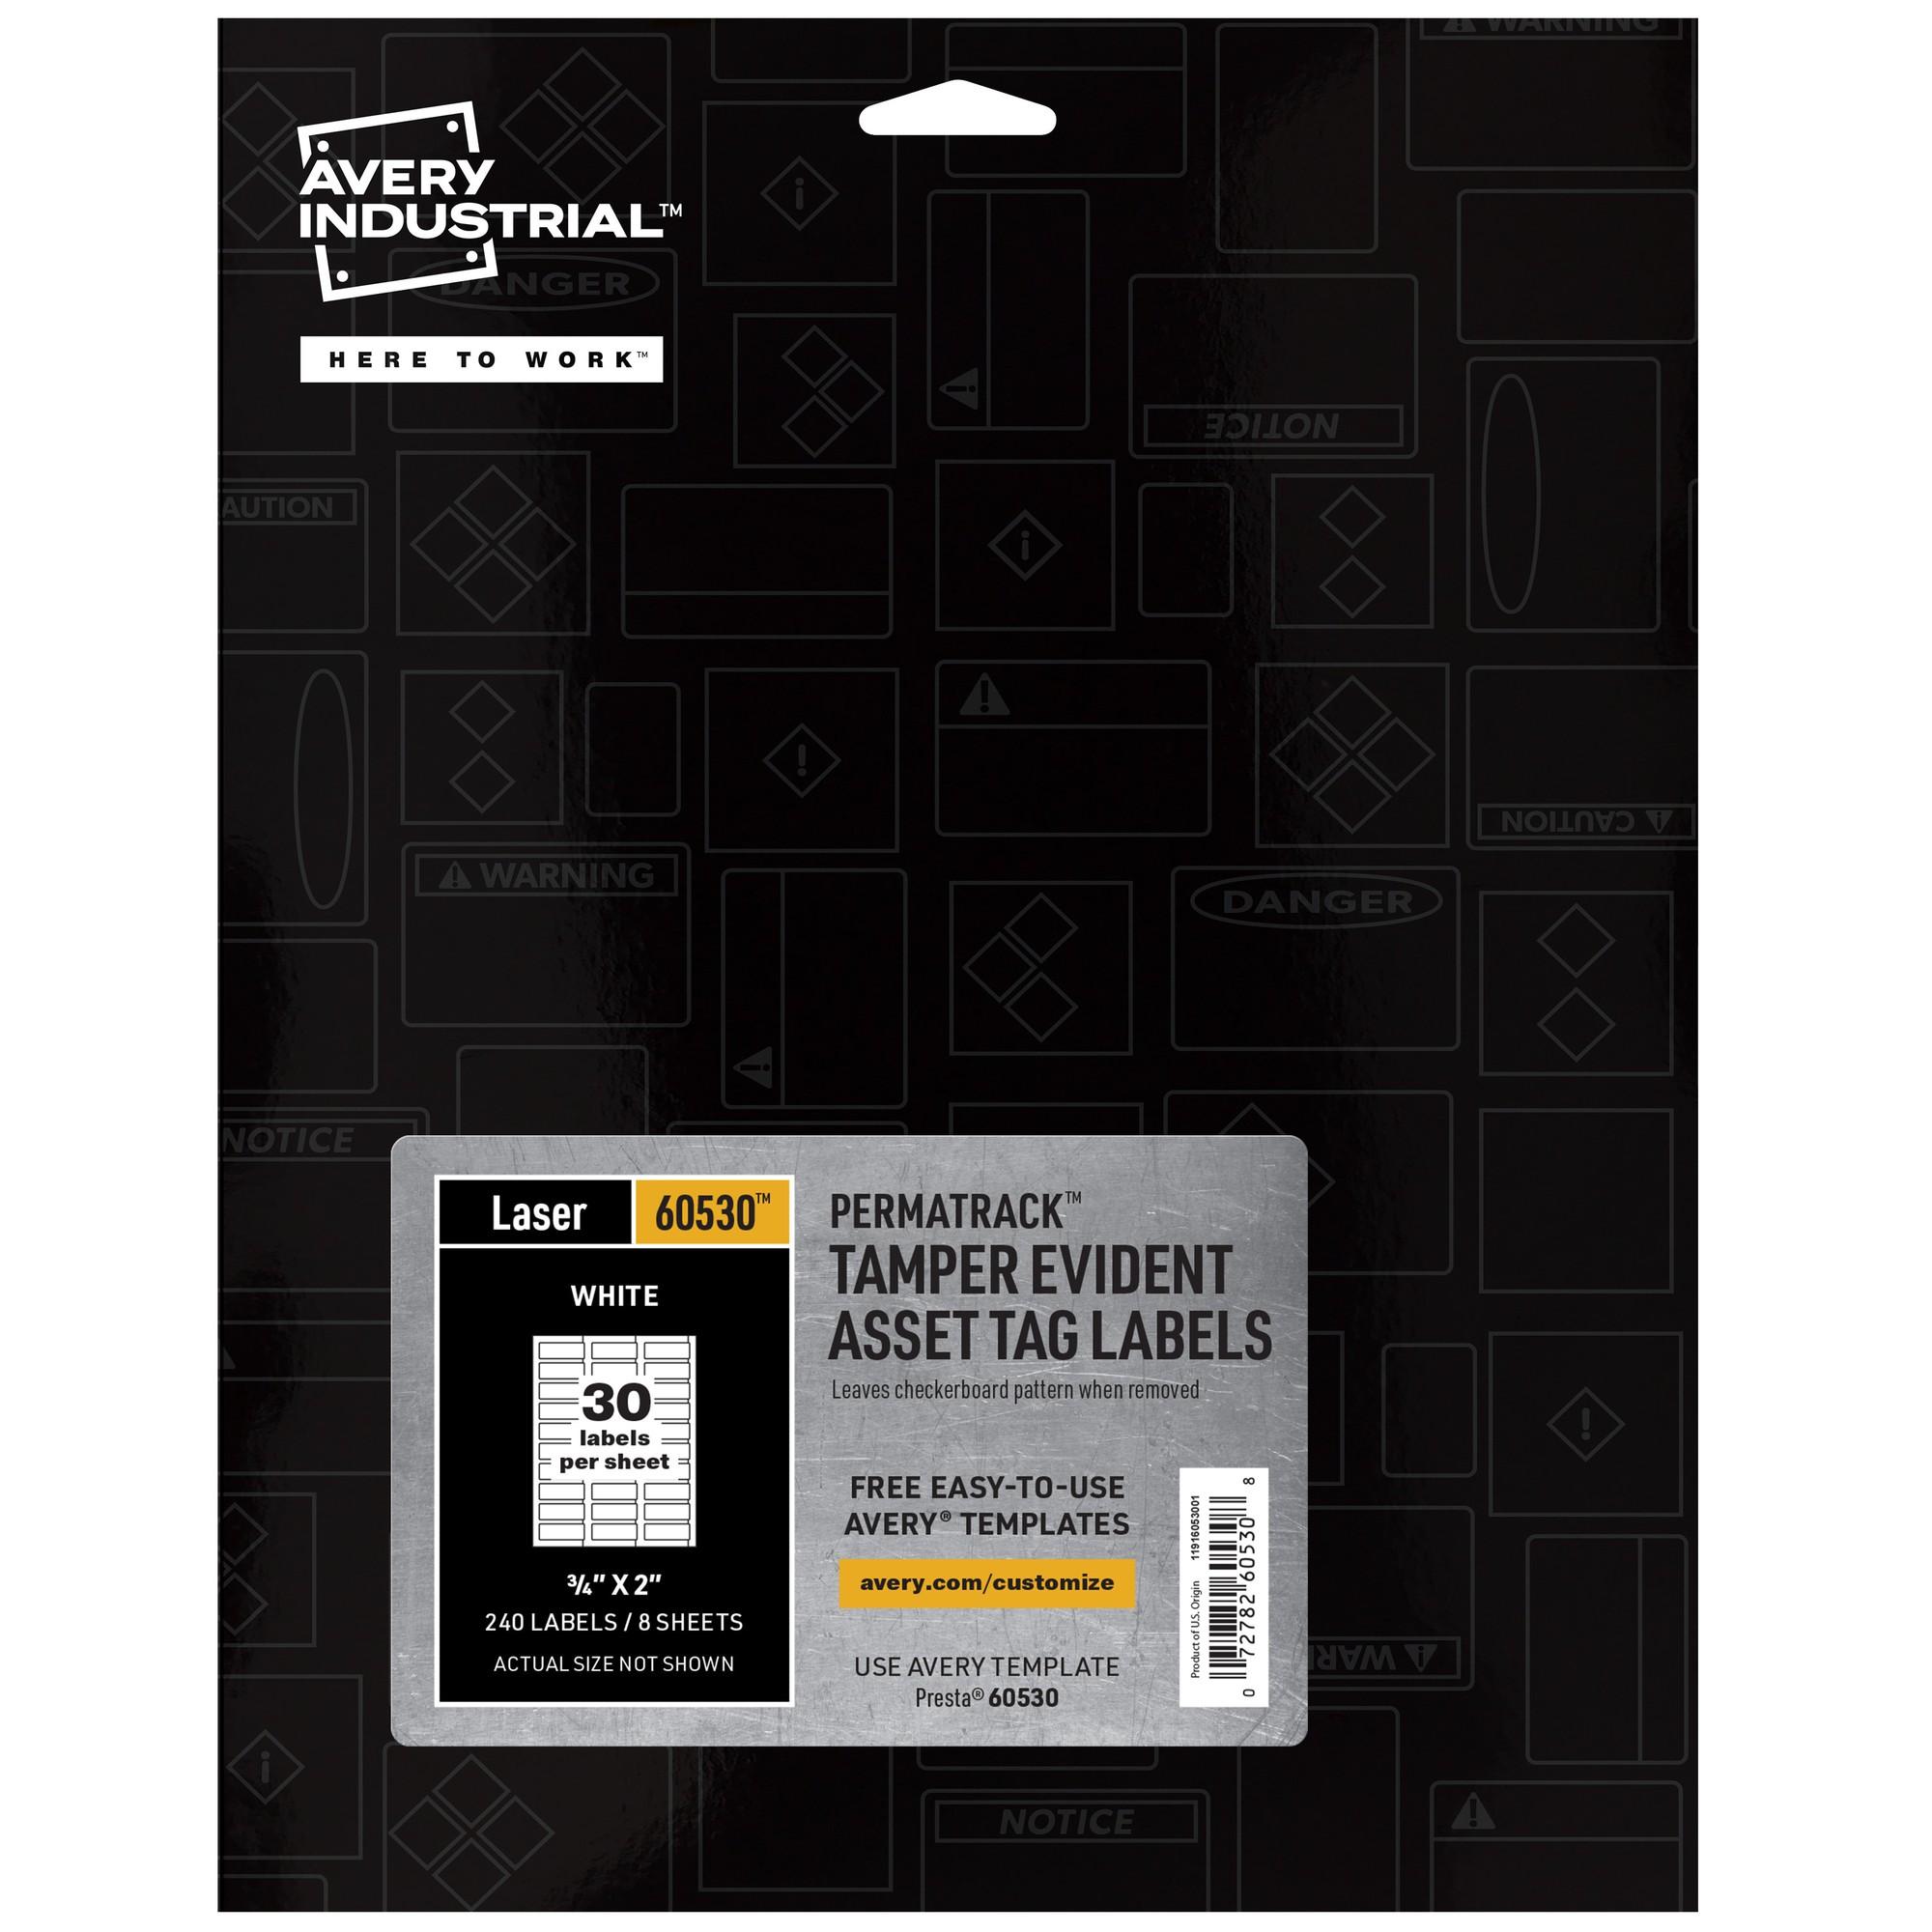 PermaTrack Tamper-Evident Asset Tag Labels, Laser Printers, 0.75 x 2, White, 30/Sheet, 8 Sheets/Pack